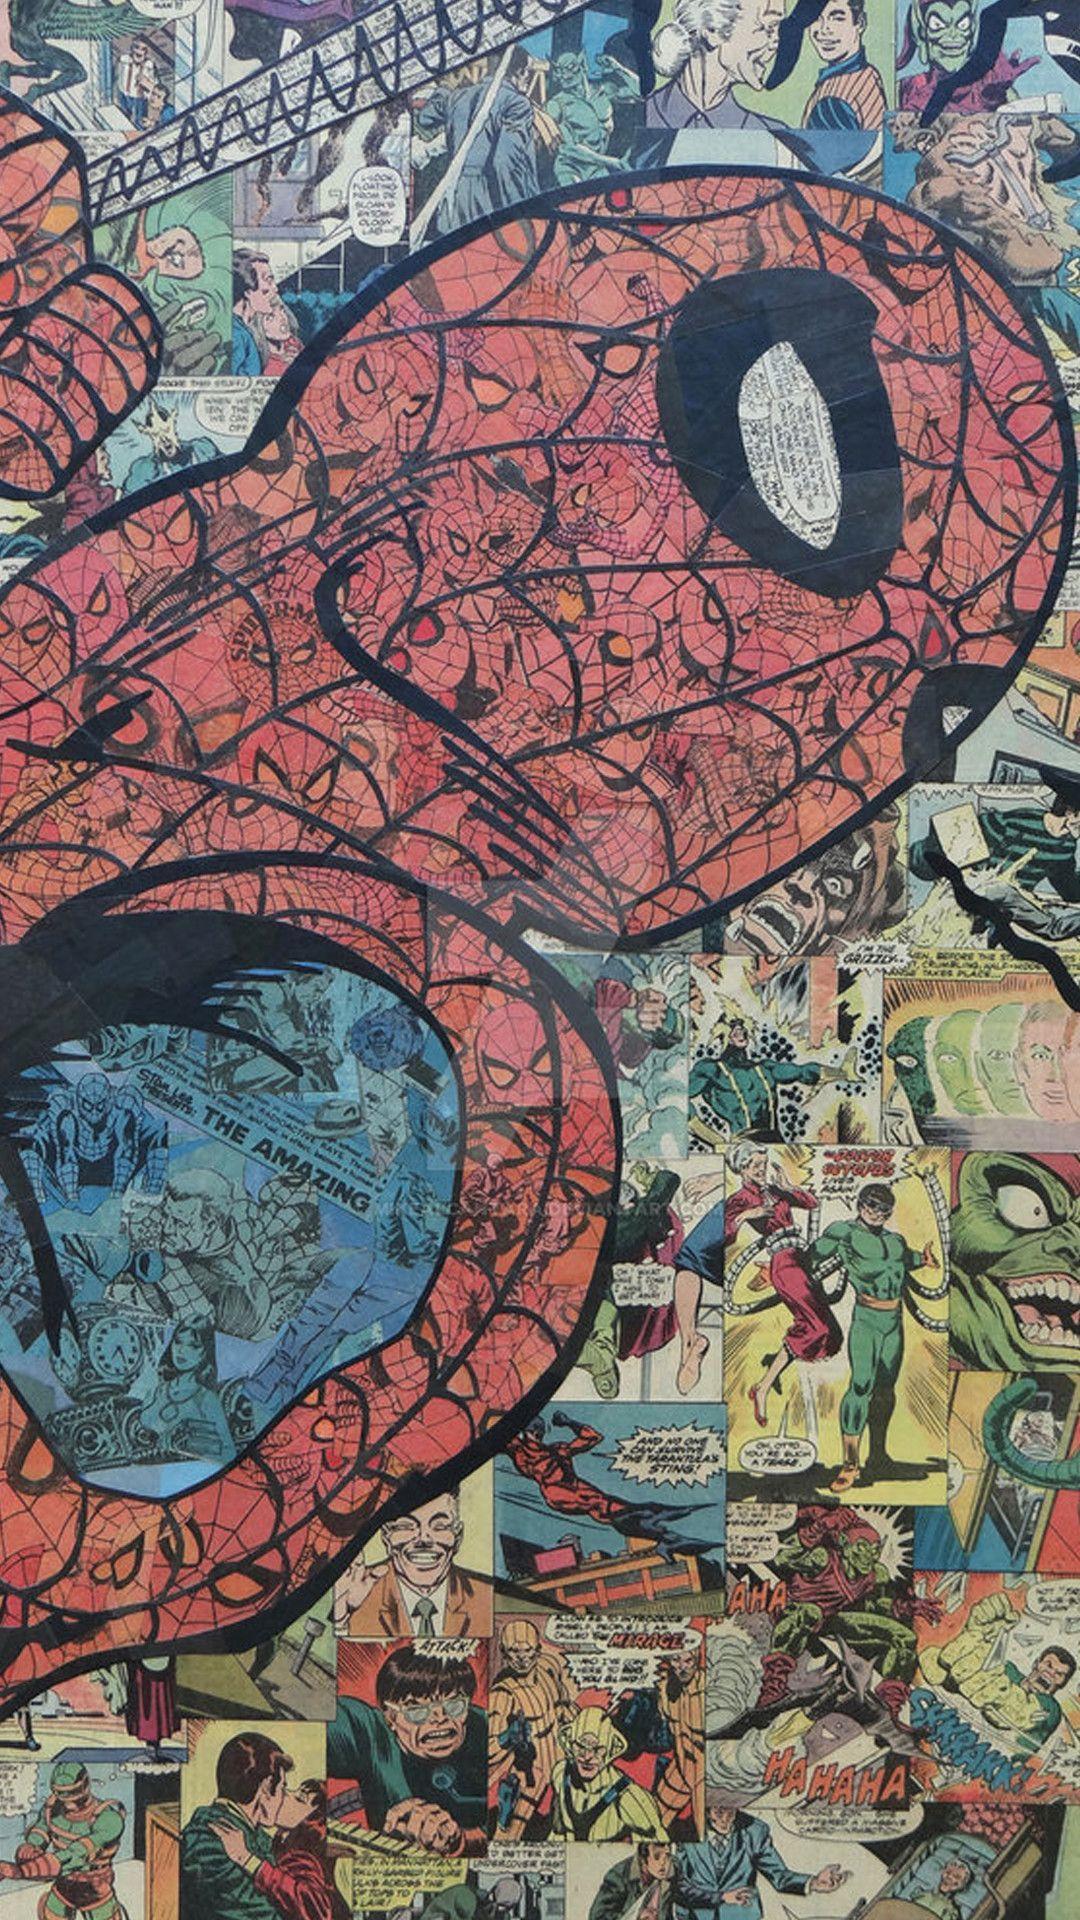 Comic Book Phone Wallpapers Top Free Comic Book Phone Backgrounds Wallpaperaccess